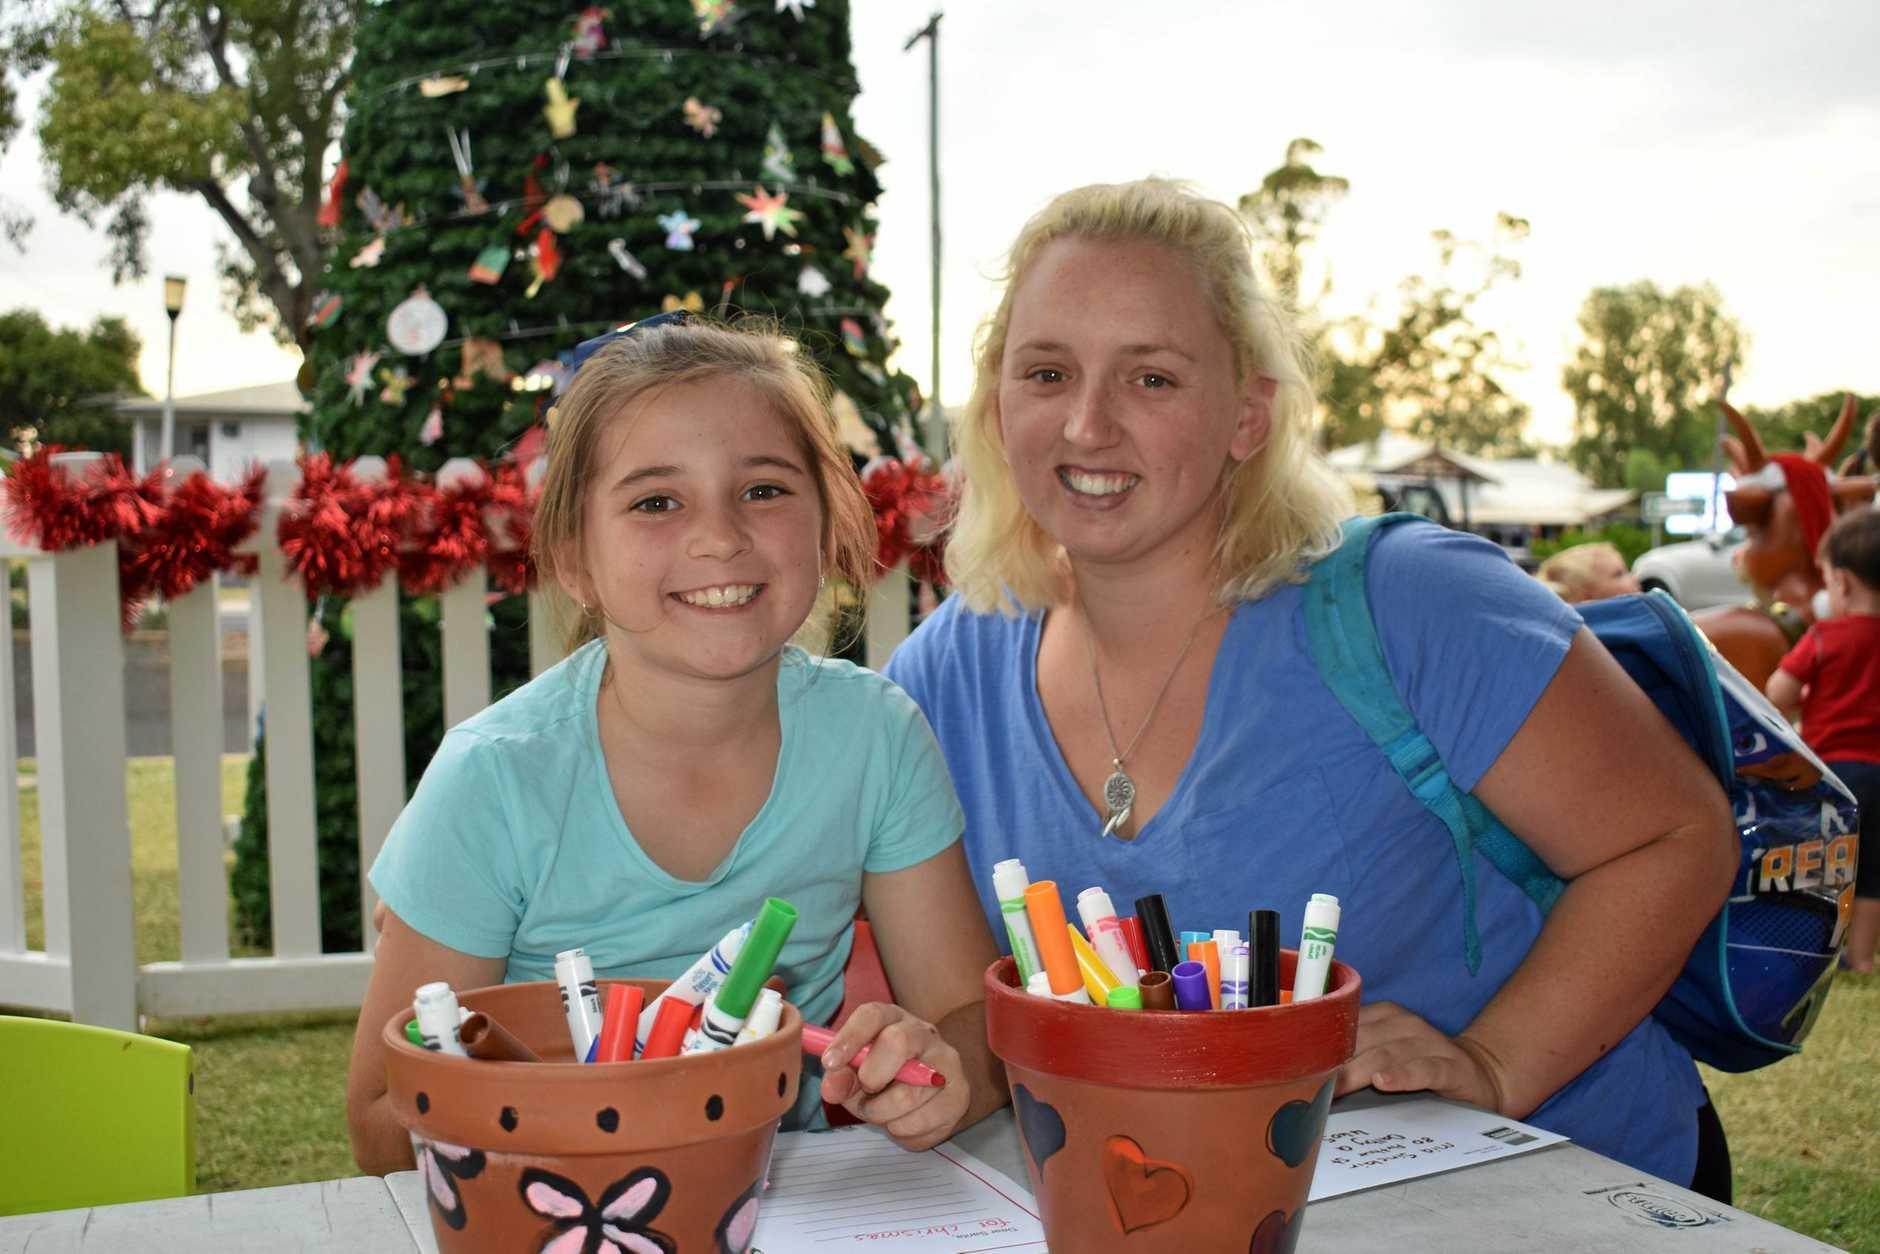 JINGLE BELLS: Mia Sinclair and Kaitlin Rix